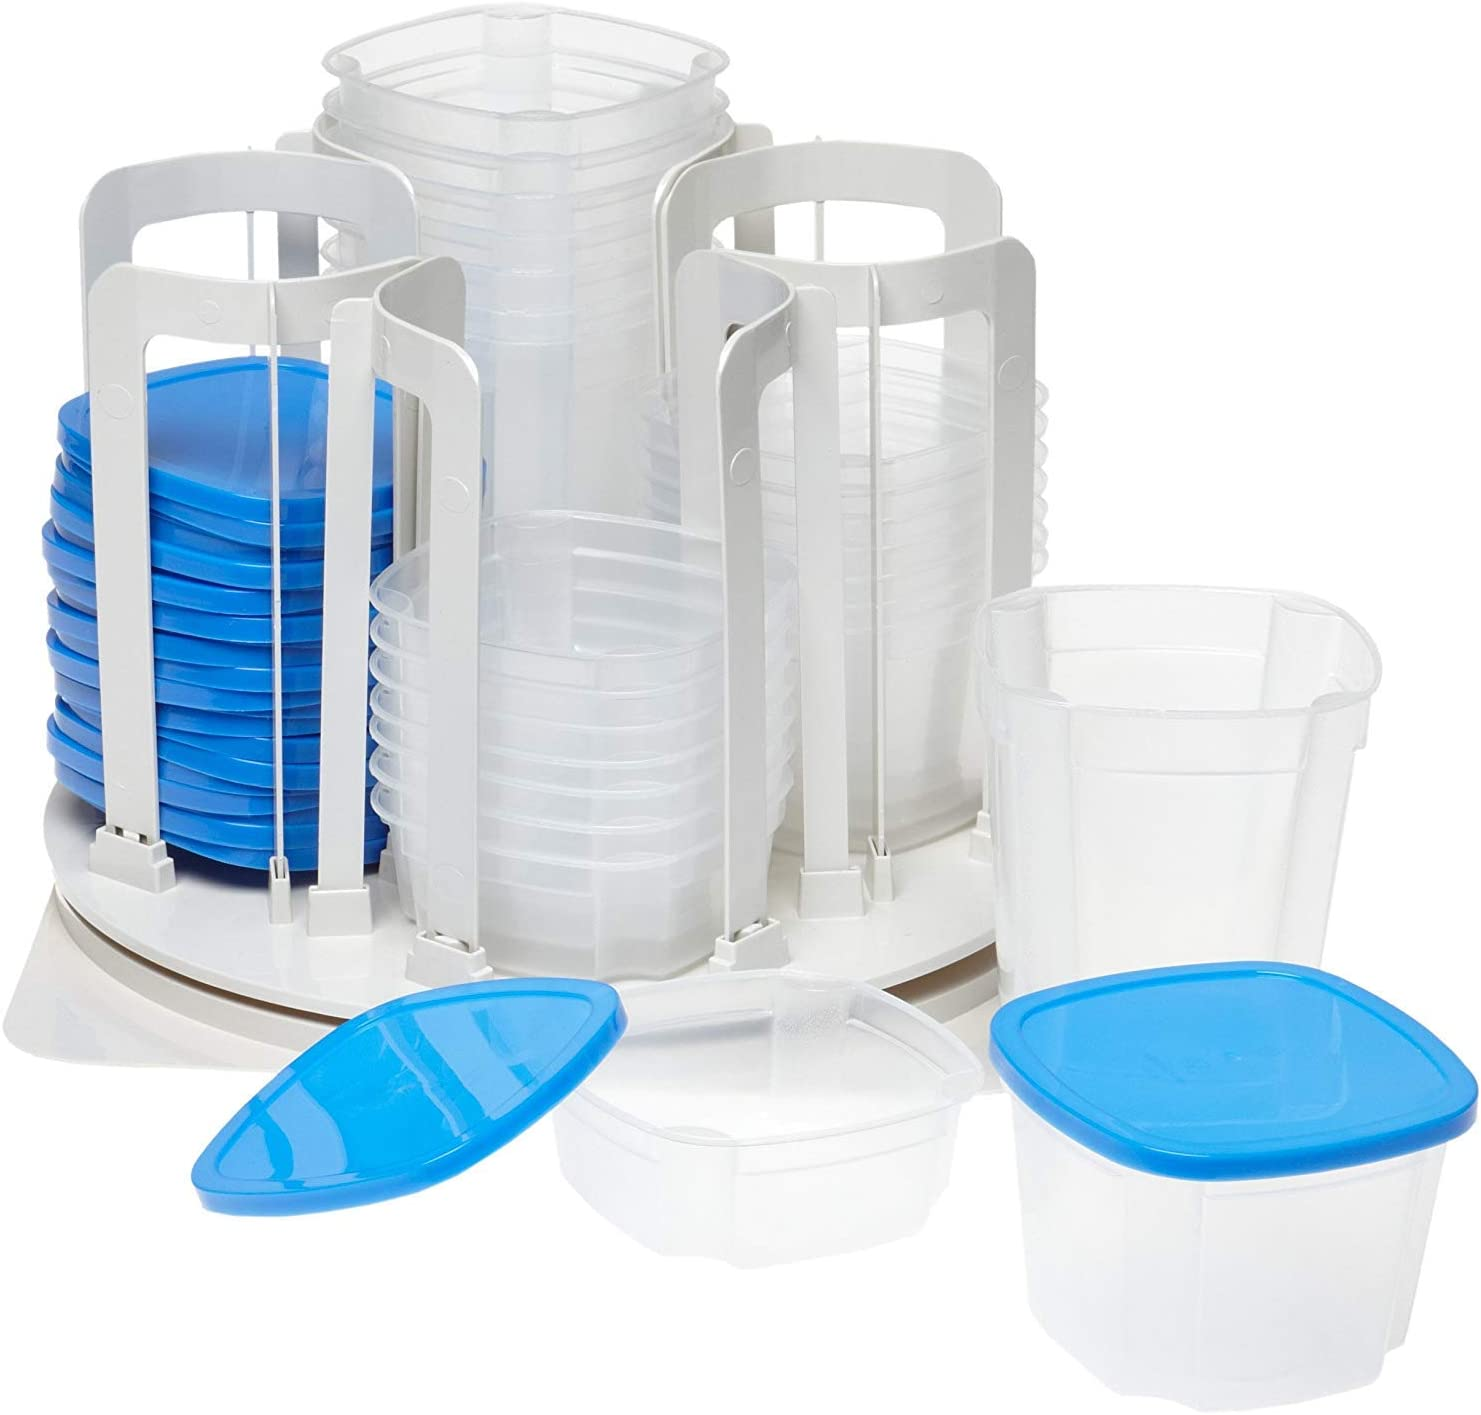 Smart Spin F Food Storage & Organization System-Microwave & Dishwasher Safe-BPA Free, 1, Blue